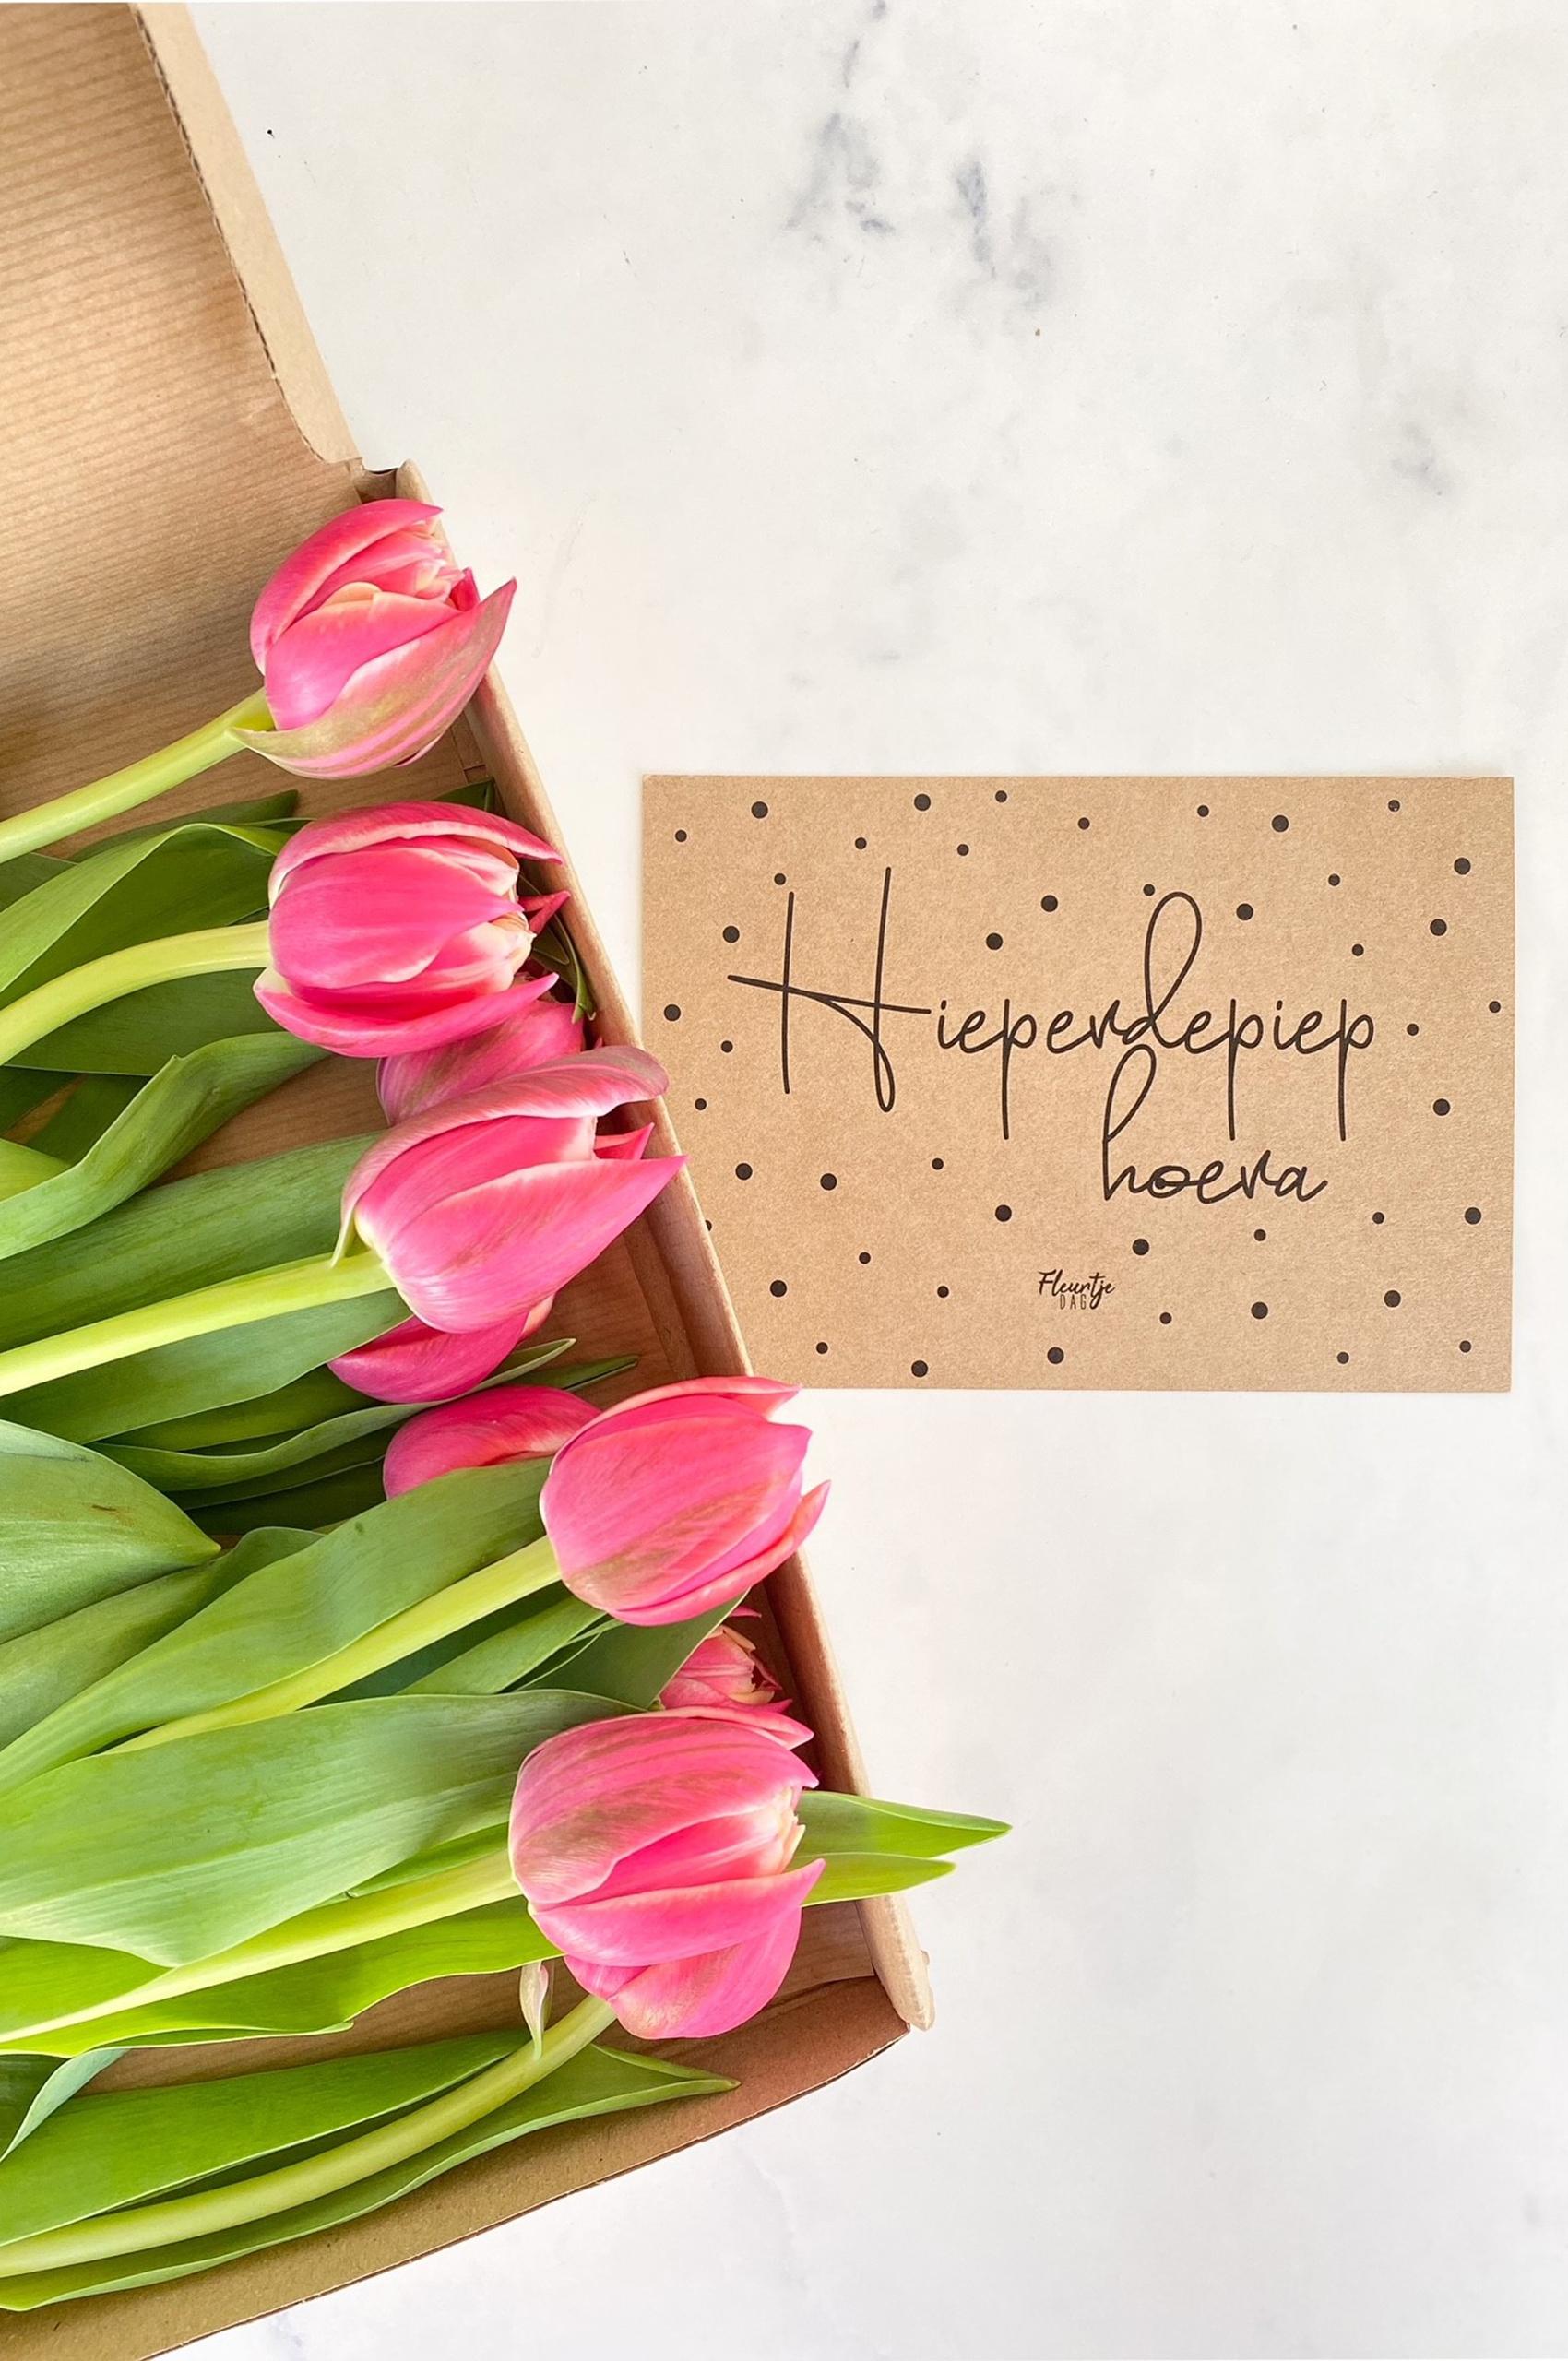 fleurtjedag brievenbusbloemen tulpen waarderingspakketjes cadeau collega verjaardag